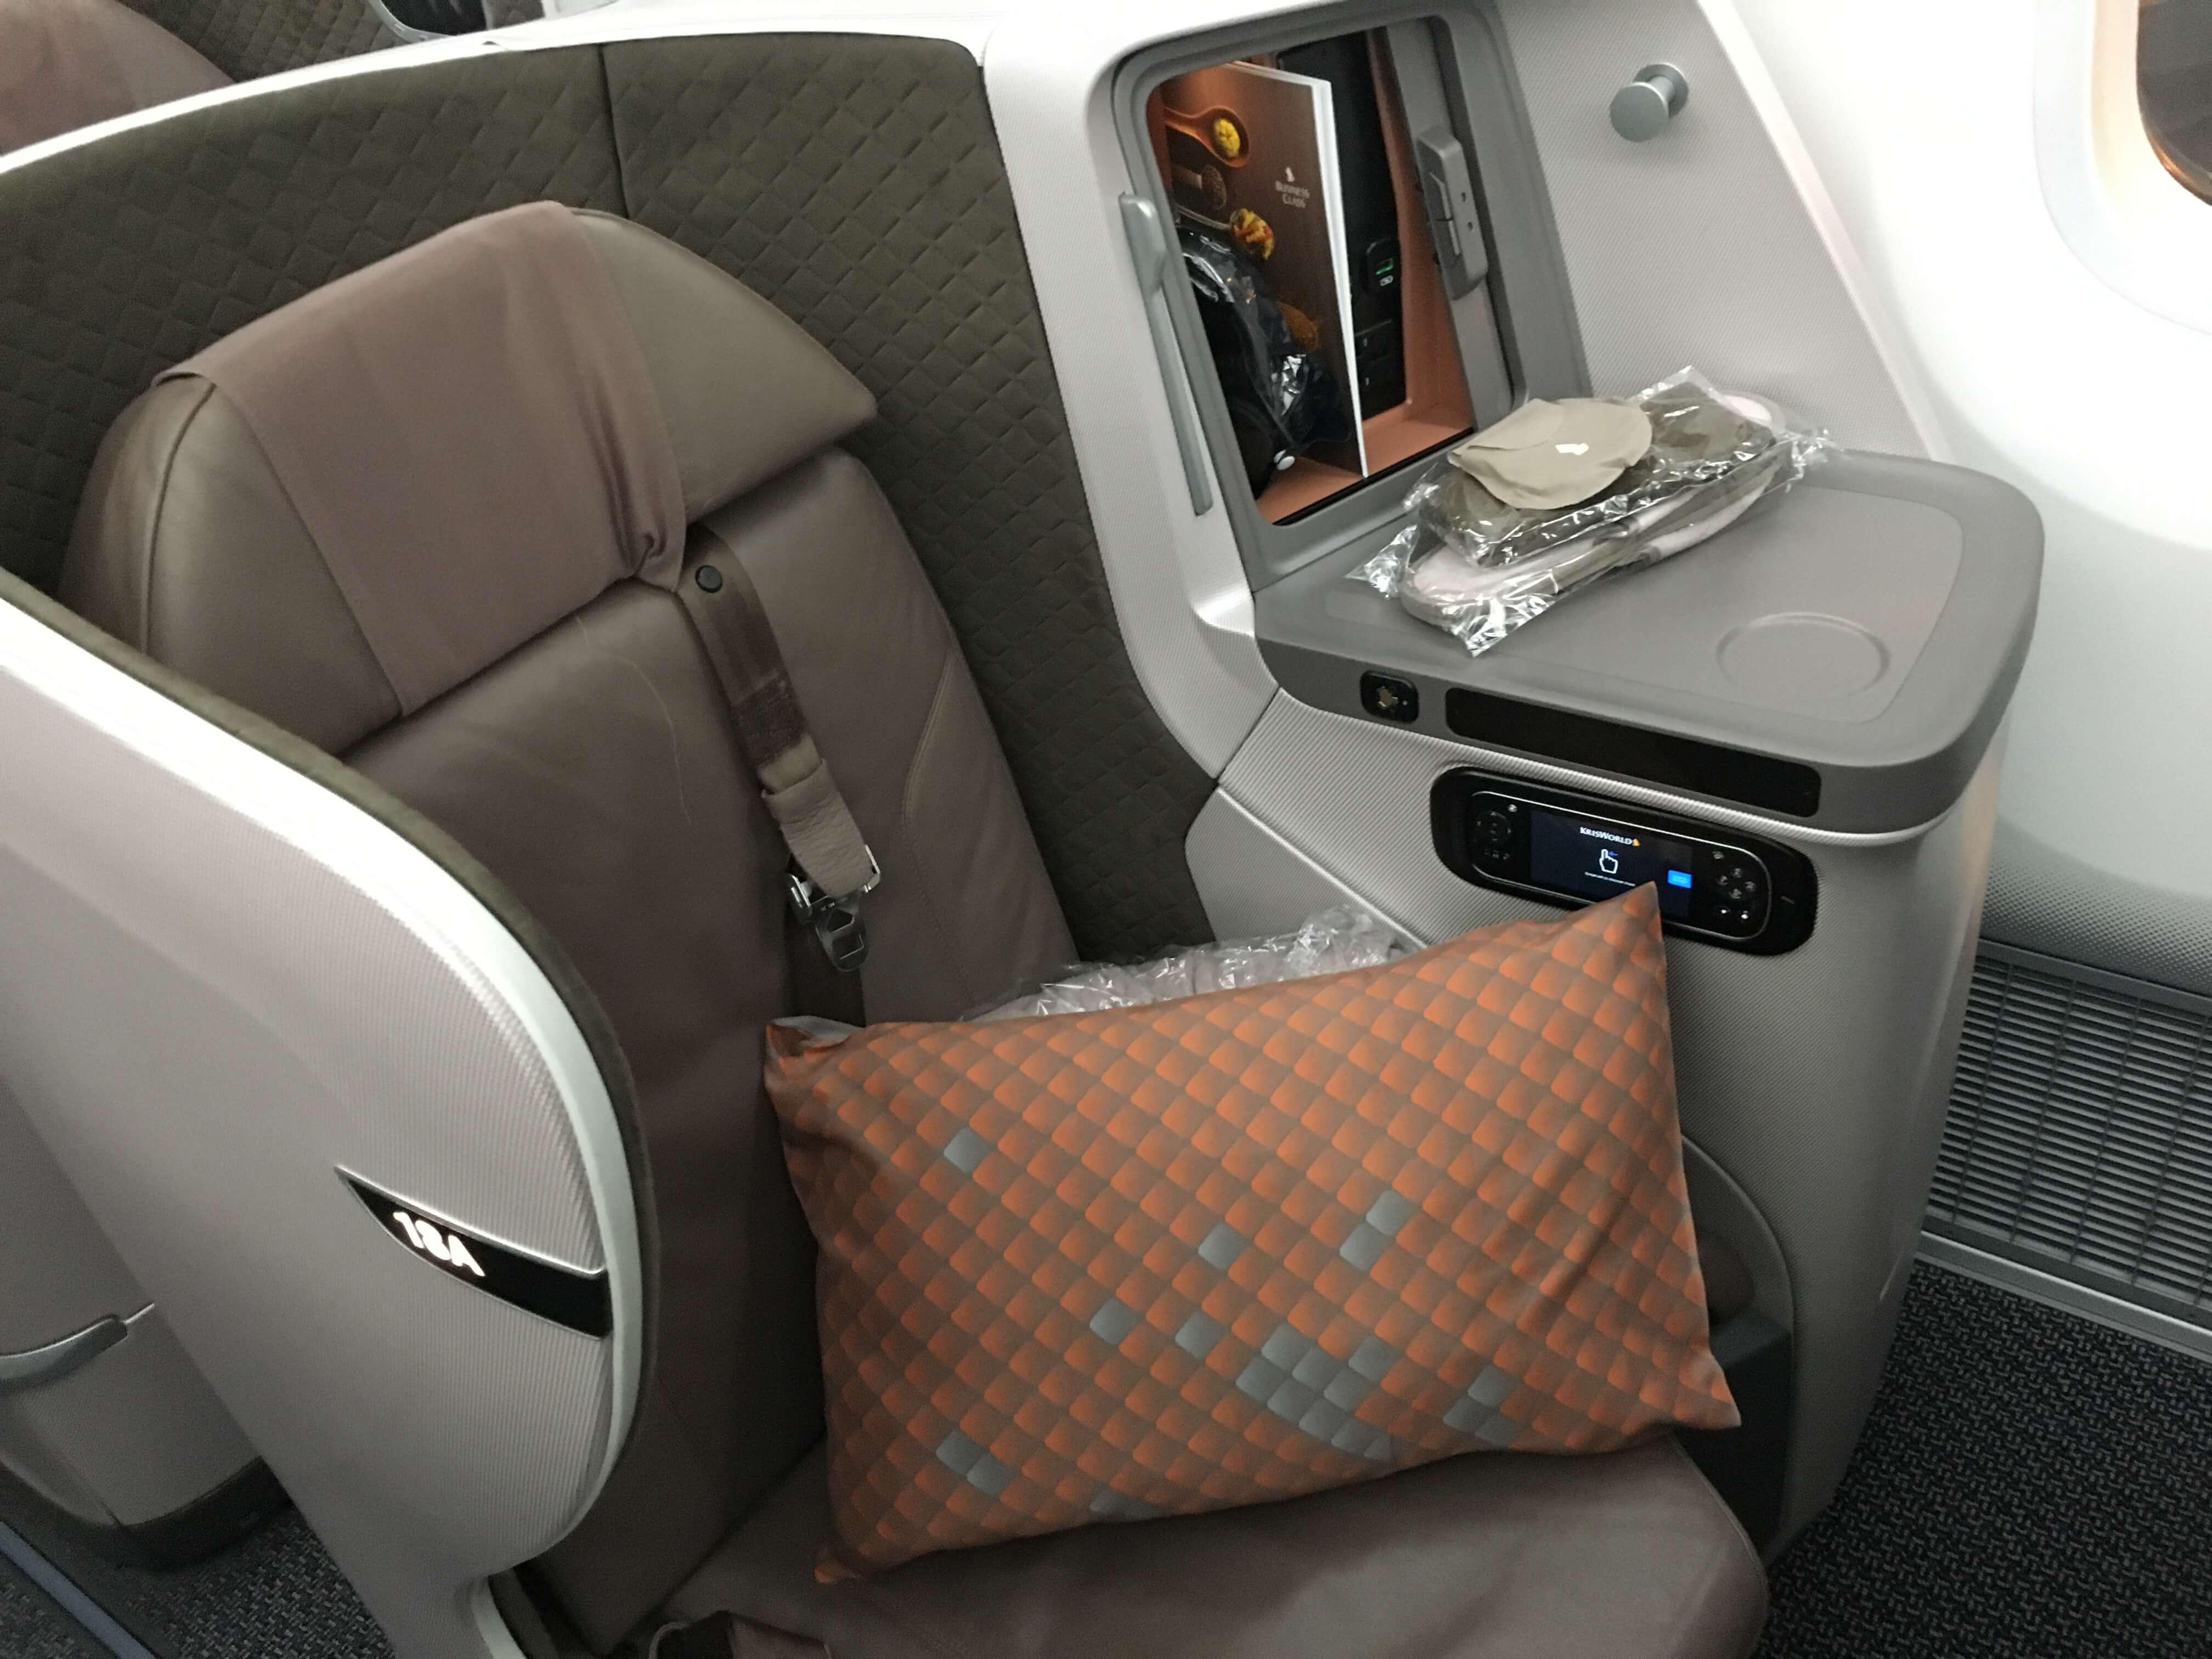 Business Class Review : シンガポール航空(SQ) SQ638 シンガポール(SIN) – 成田(NRT) Boeing B787-10